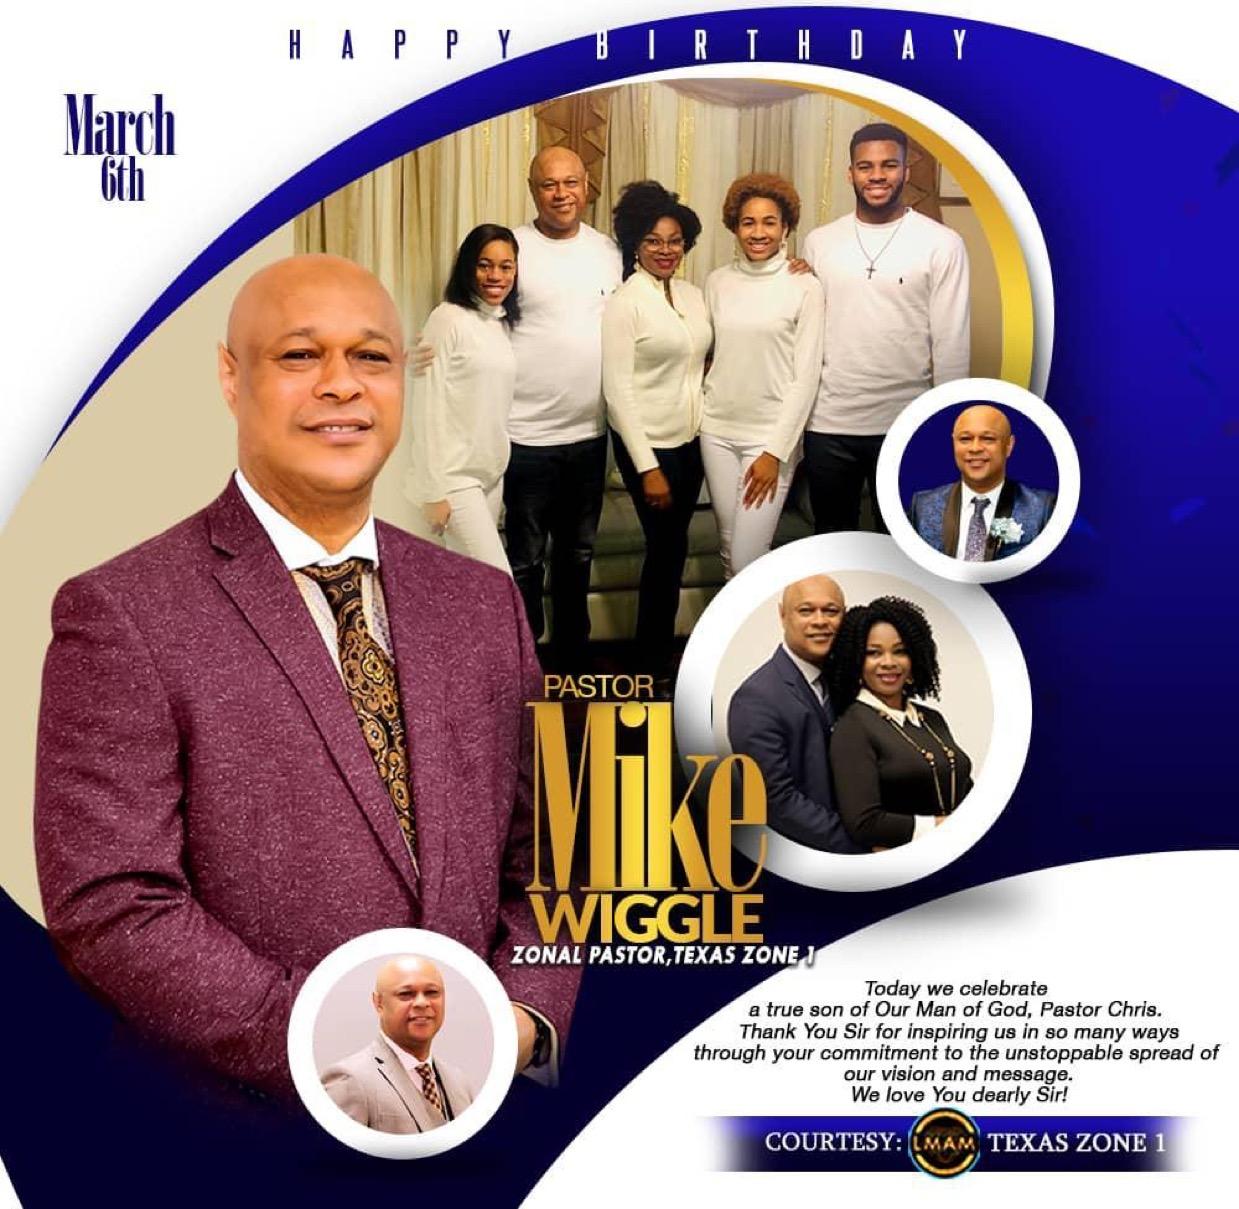 Happy Birthday pastor sir!! We